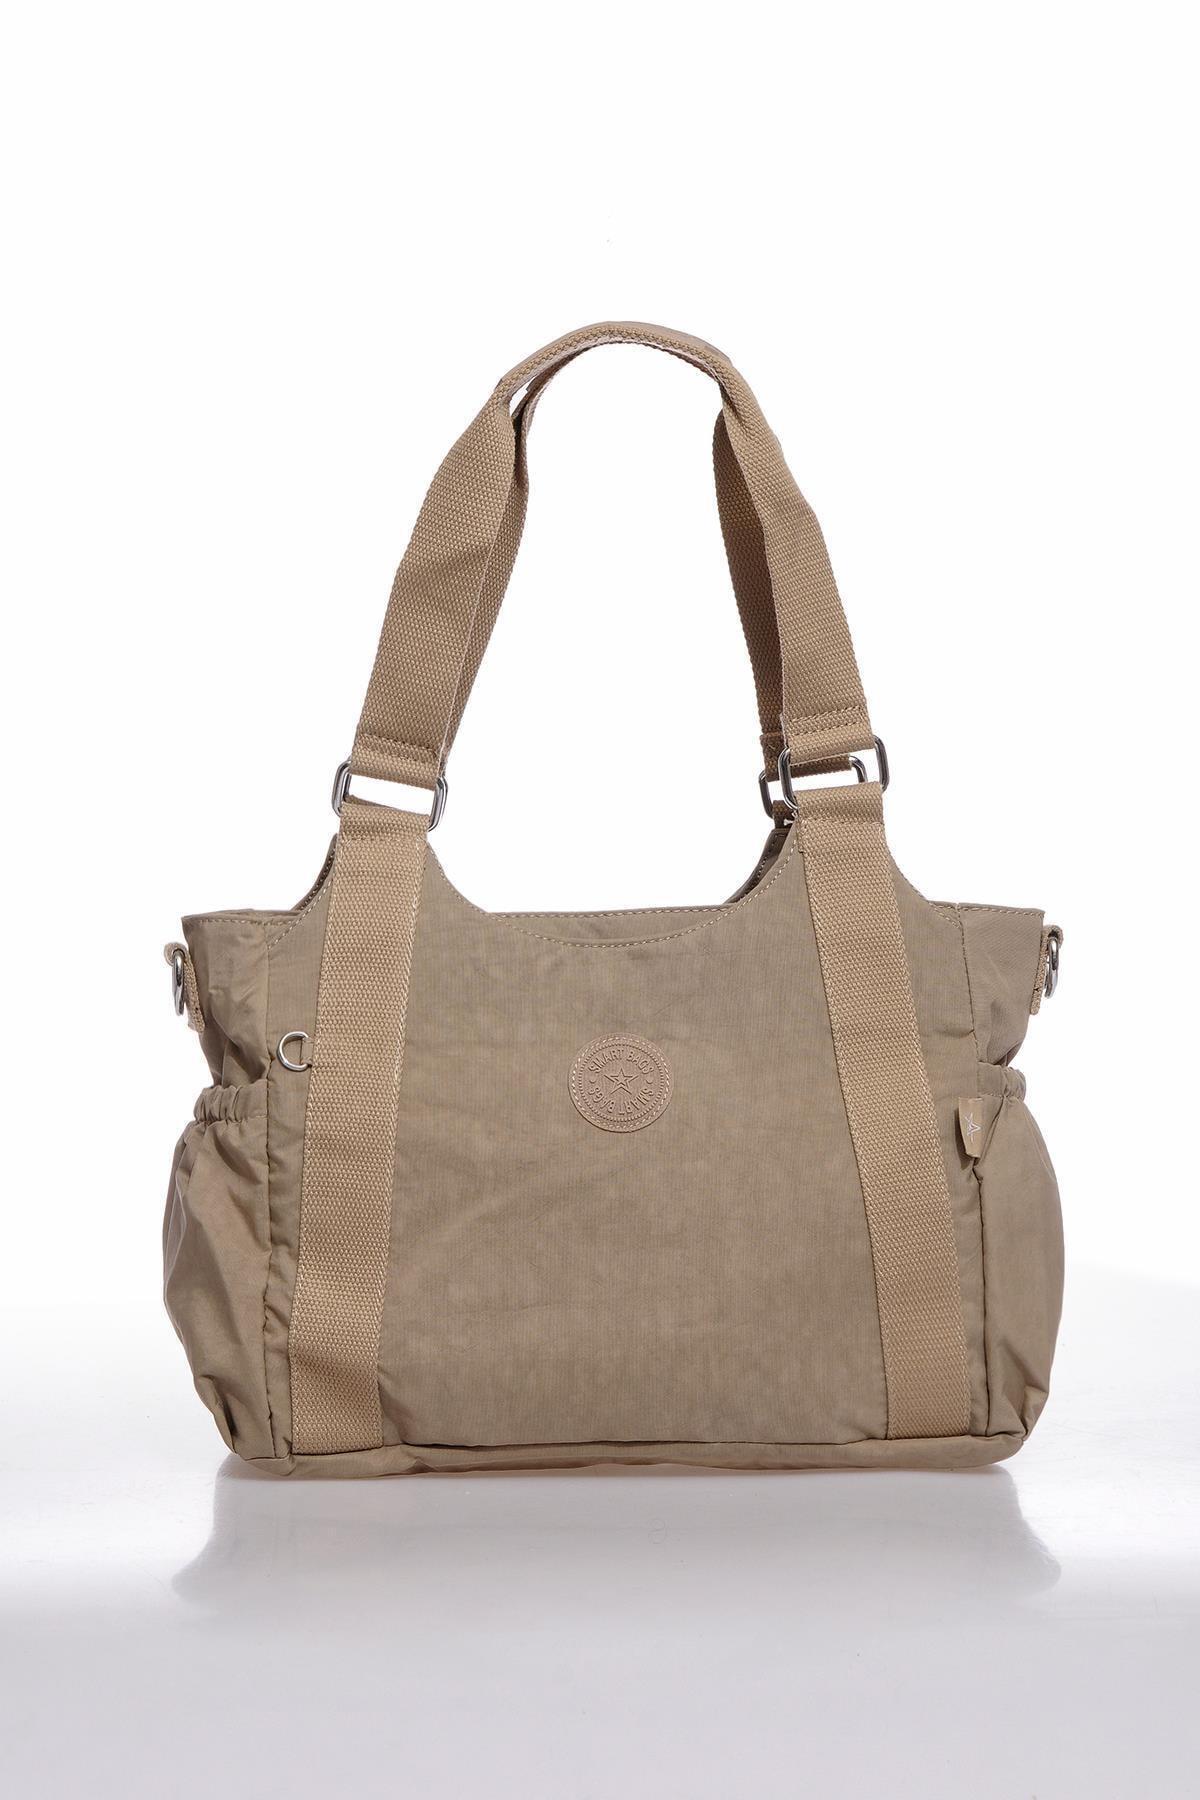 SMART BAGS Kadın Omuz Çantası Smbk1163-0015 A.vizon 1